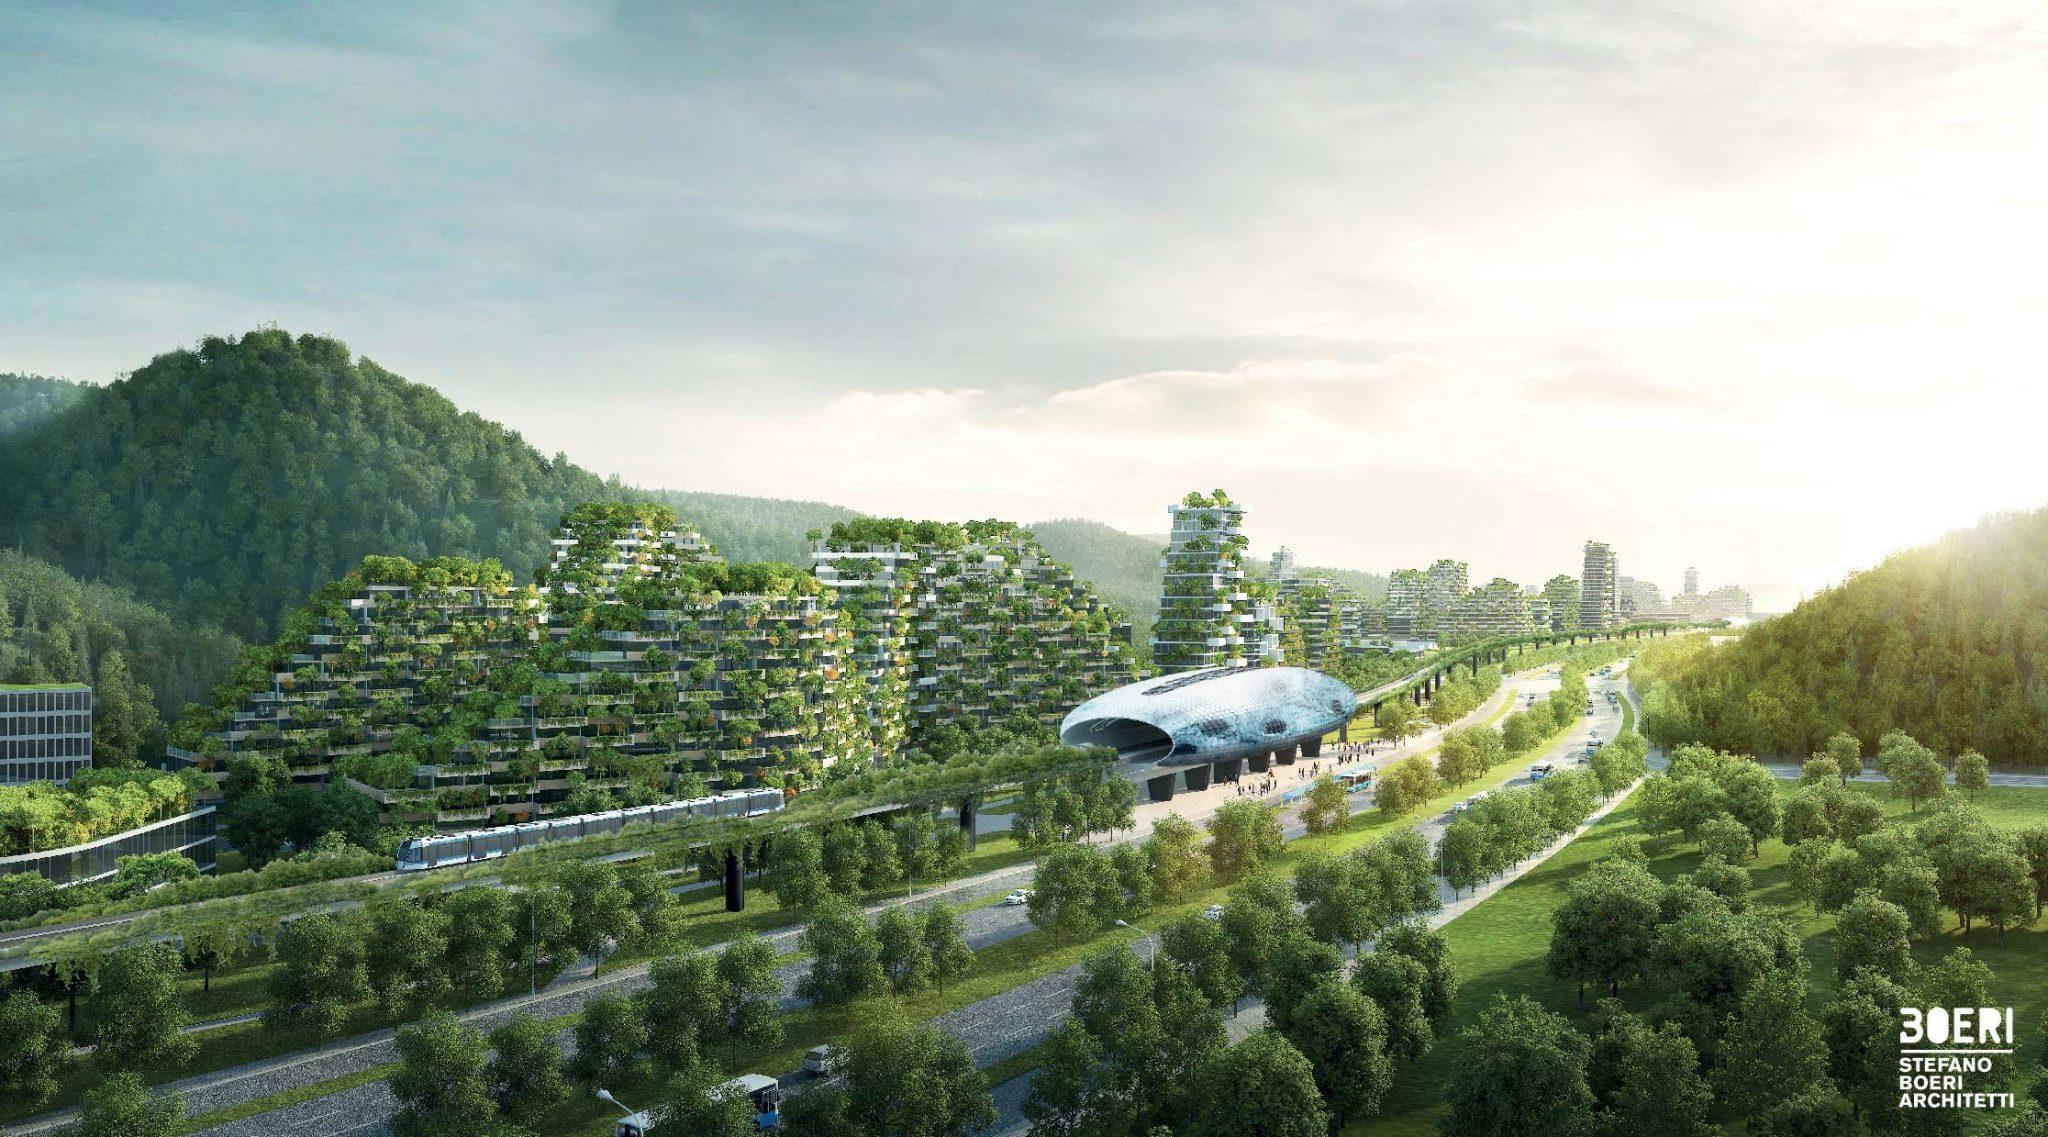 Stefano-Boeri-Architetti_Liuzhou-Forest-city_view-3-3-2232x1239